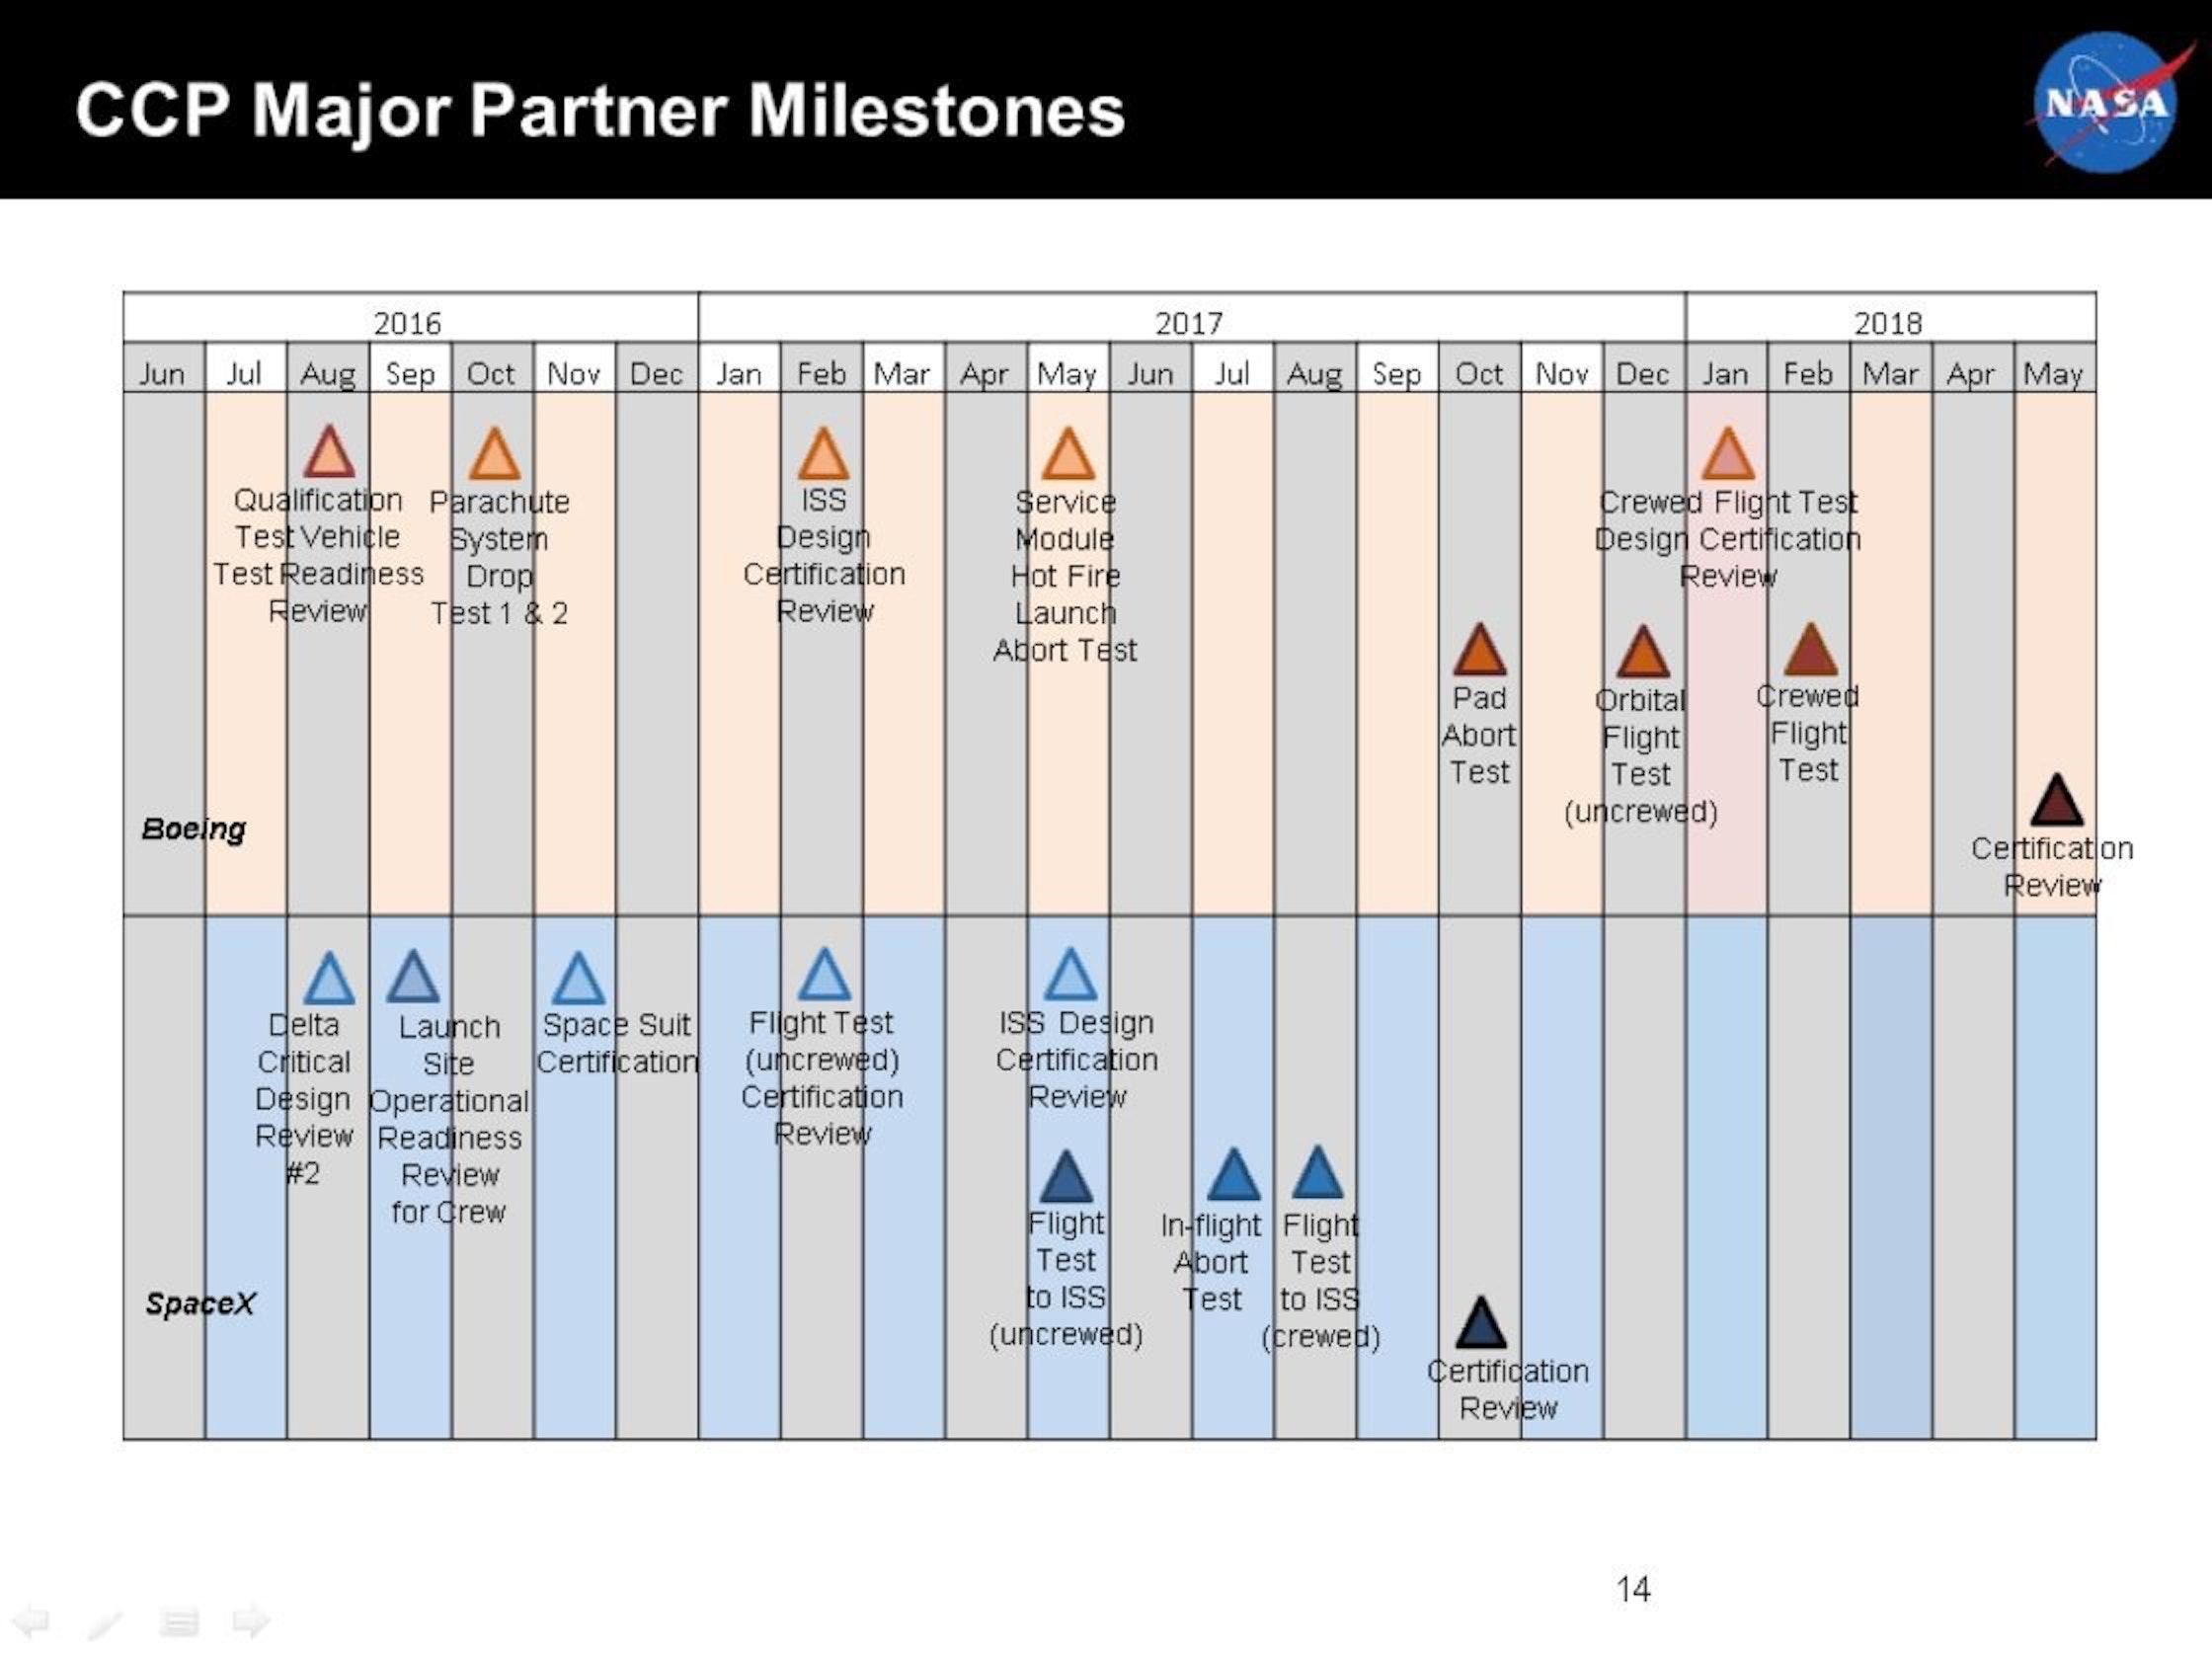 Milestones in NASA's commercial partnerships.